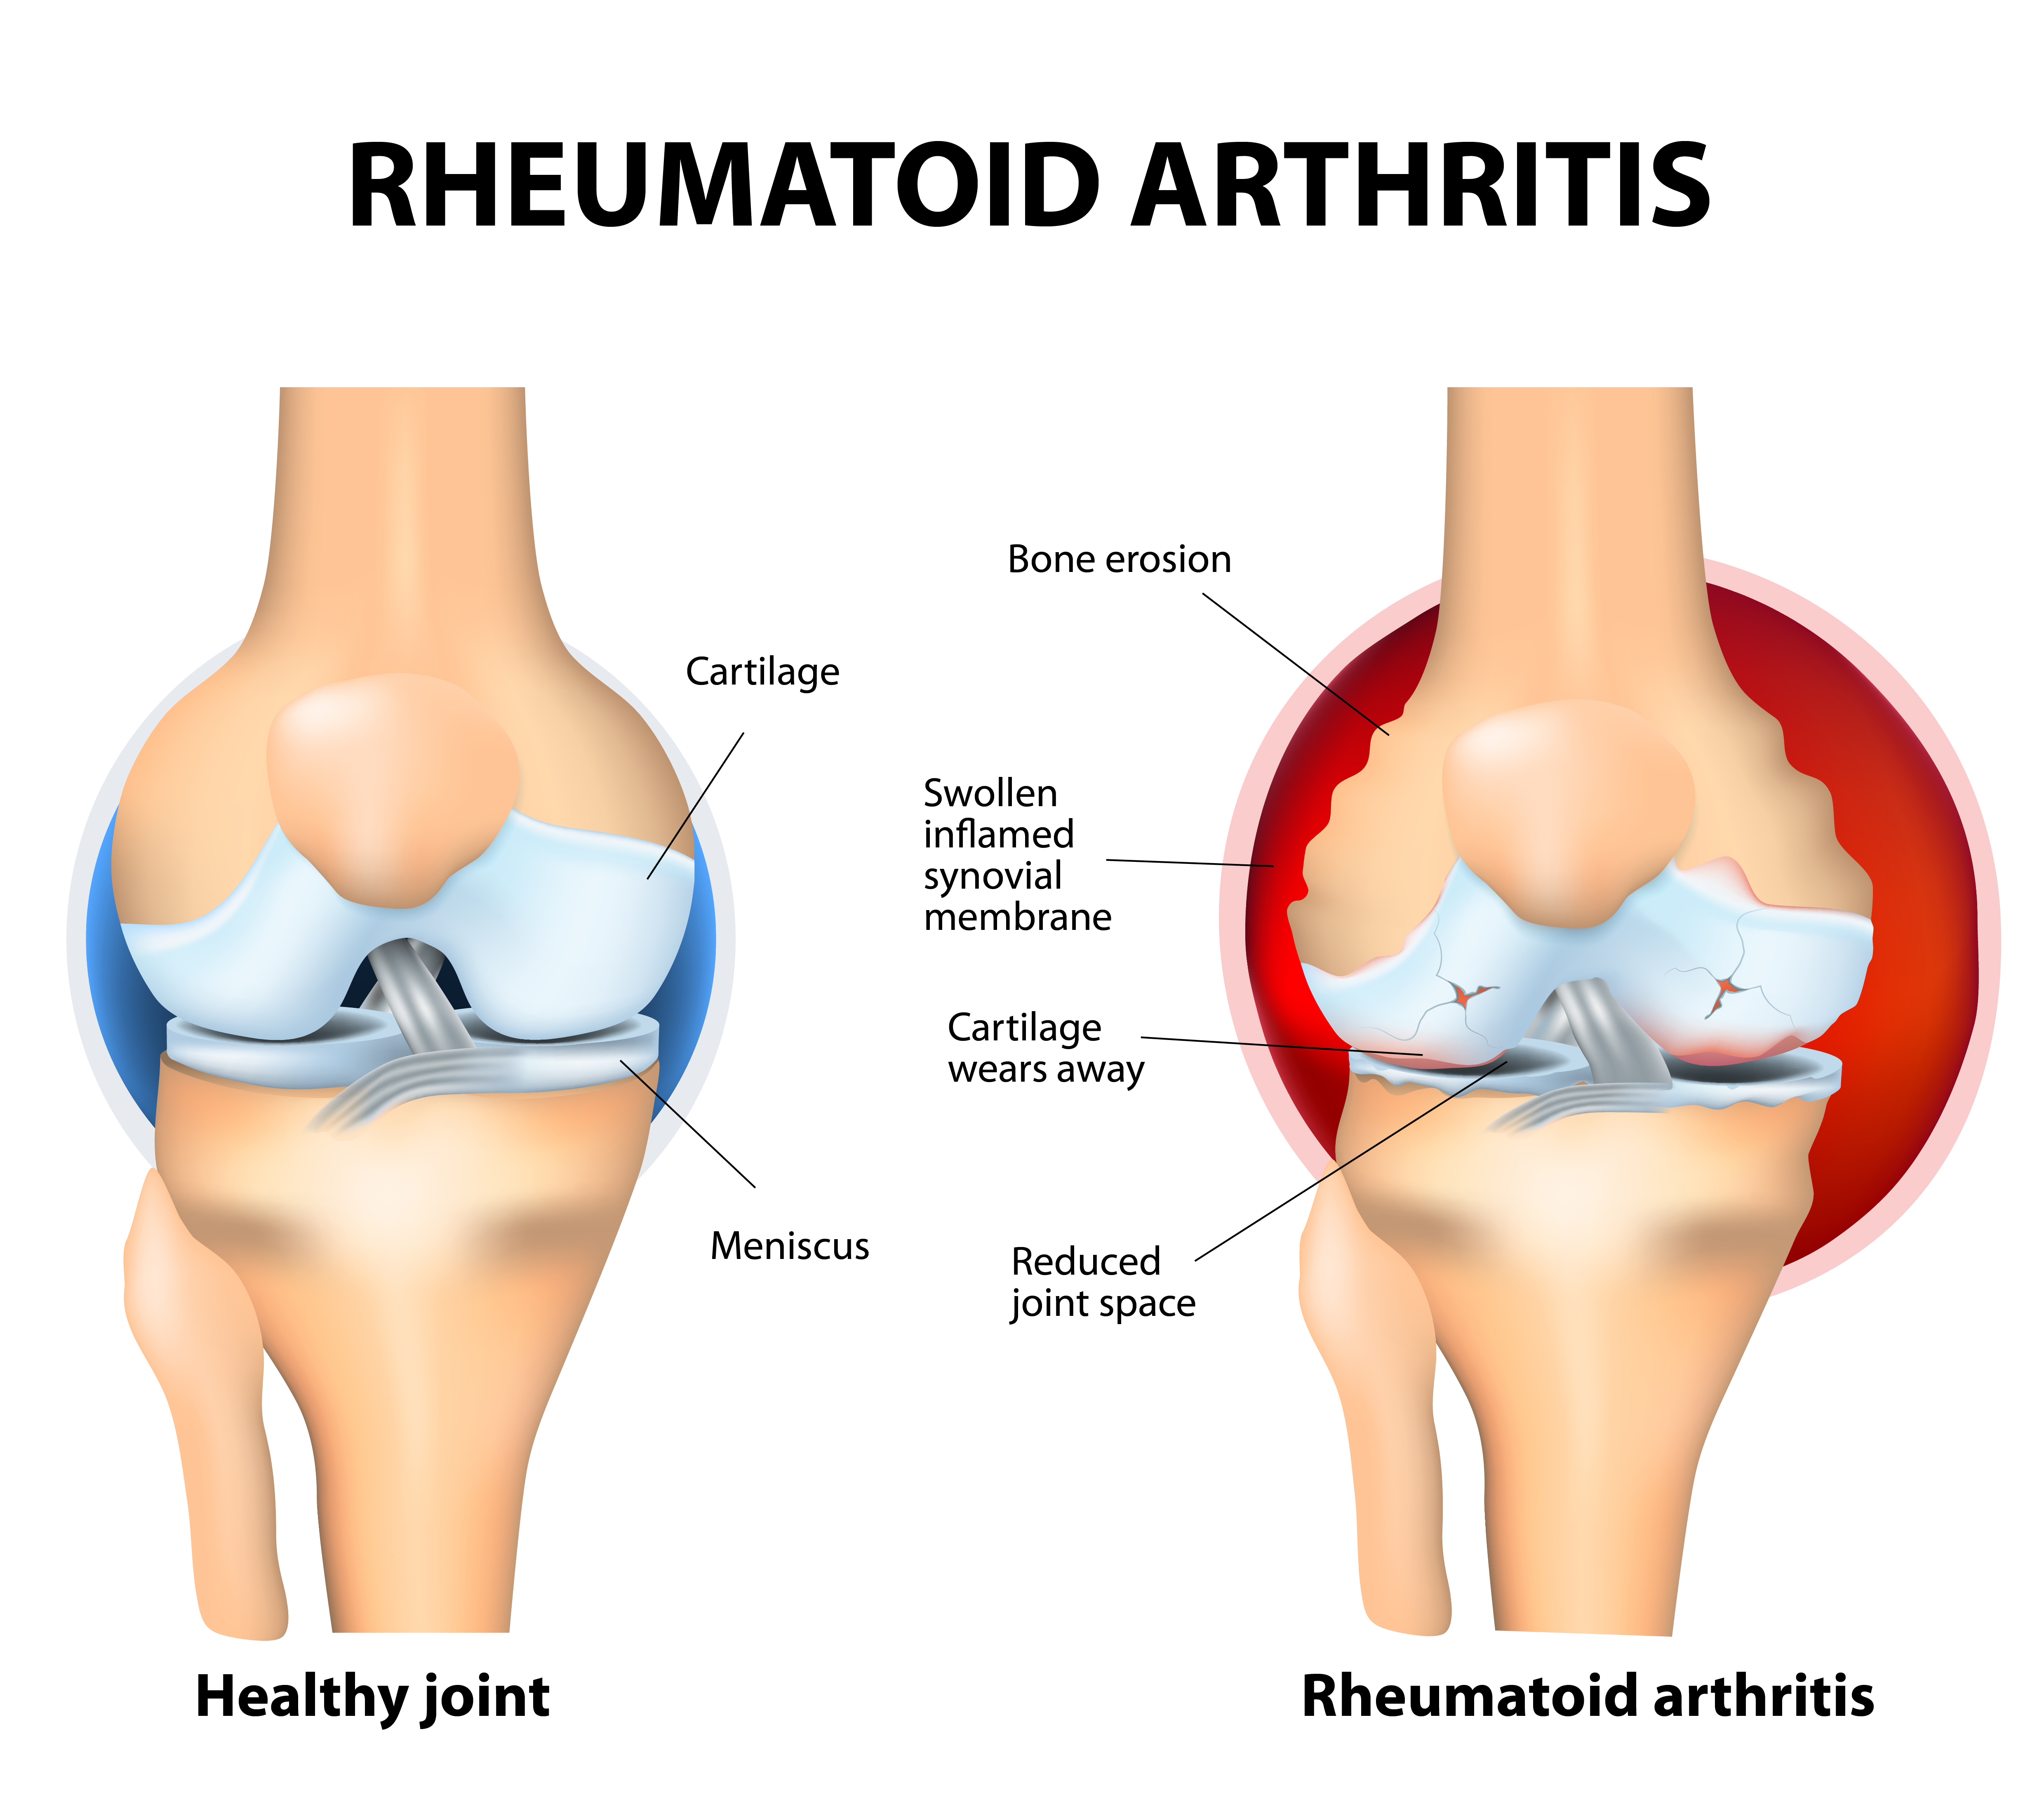 Arthritis rheumatoid (atrophic) as an active process